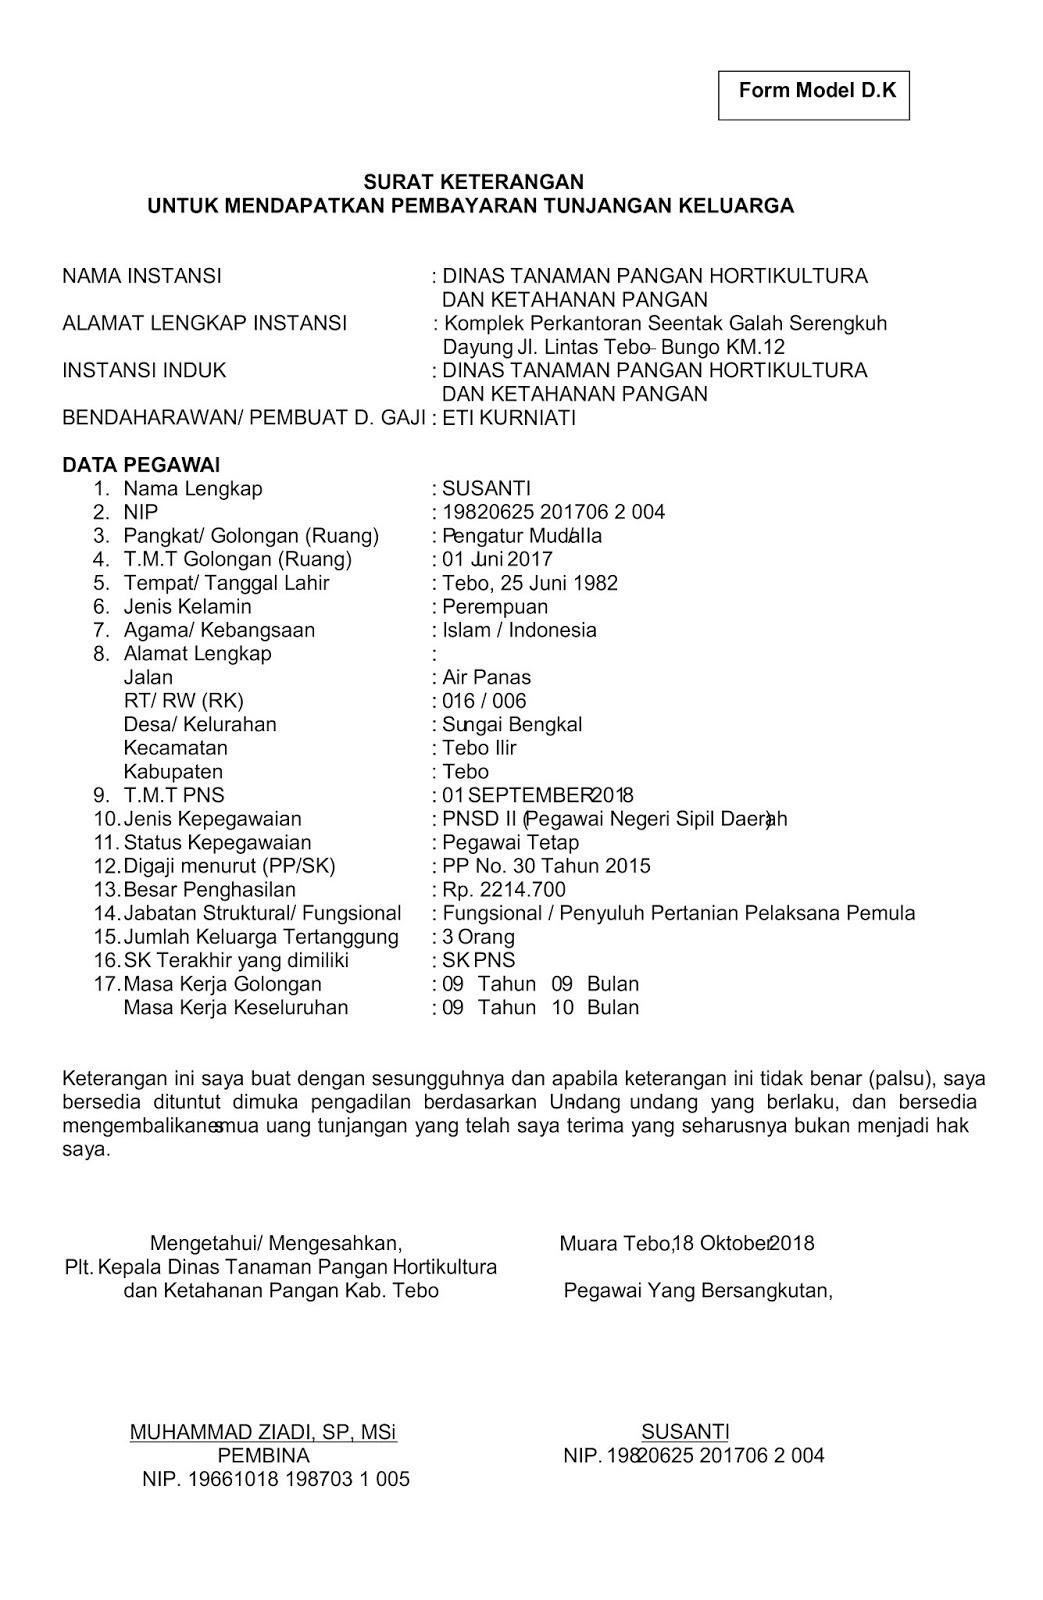 Contoh Surat Orton Surat Keterangan Untuk Mendapatkan